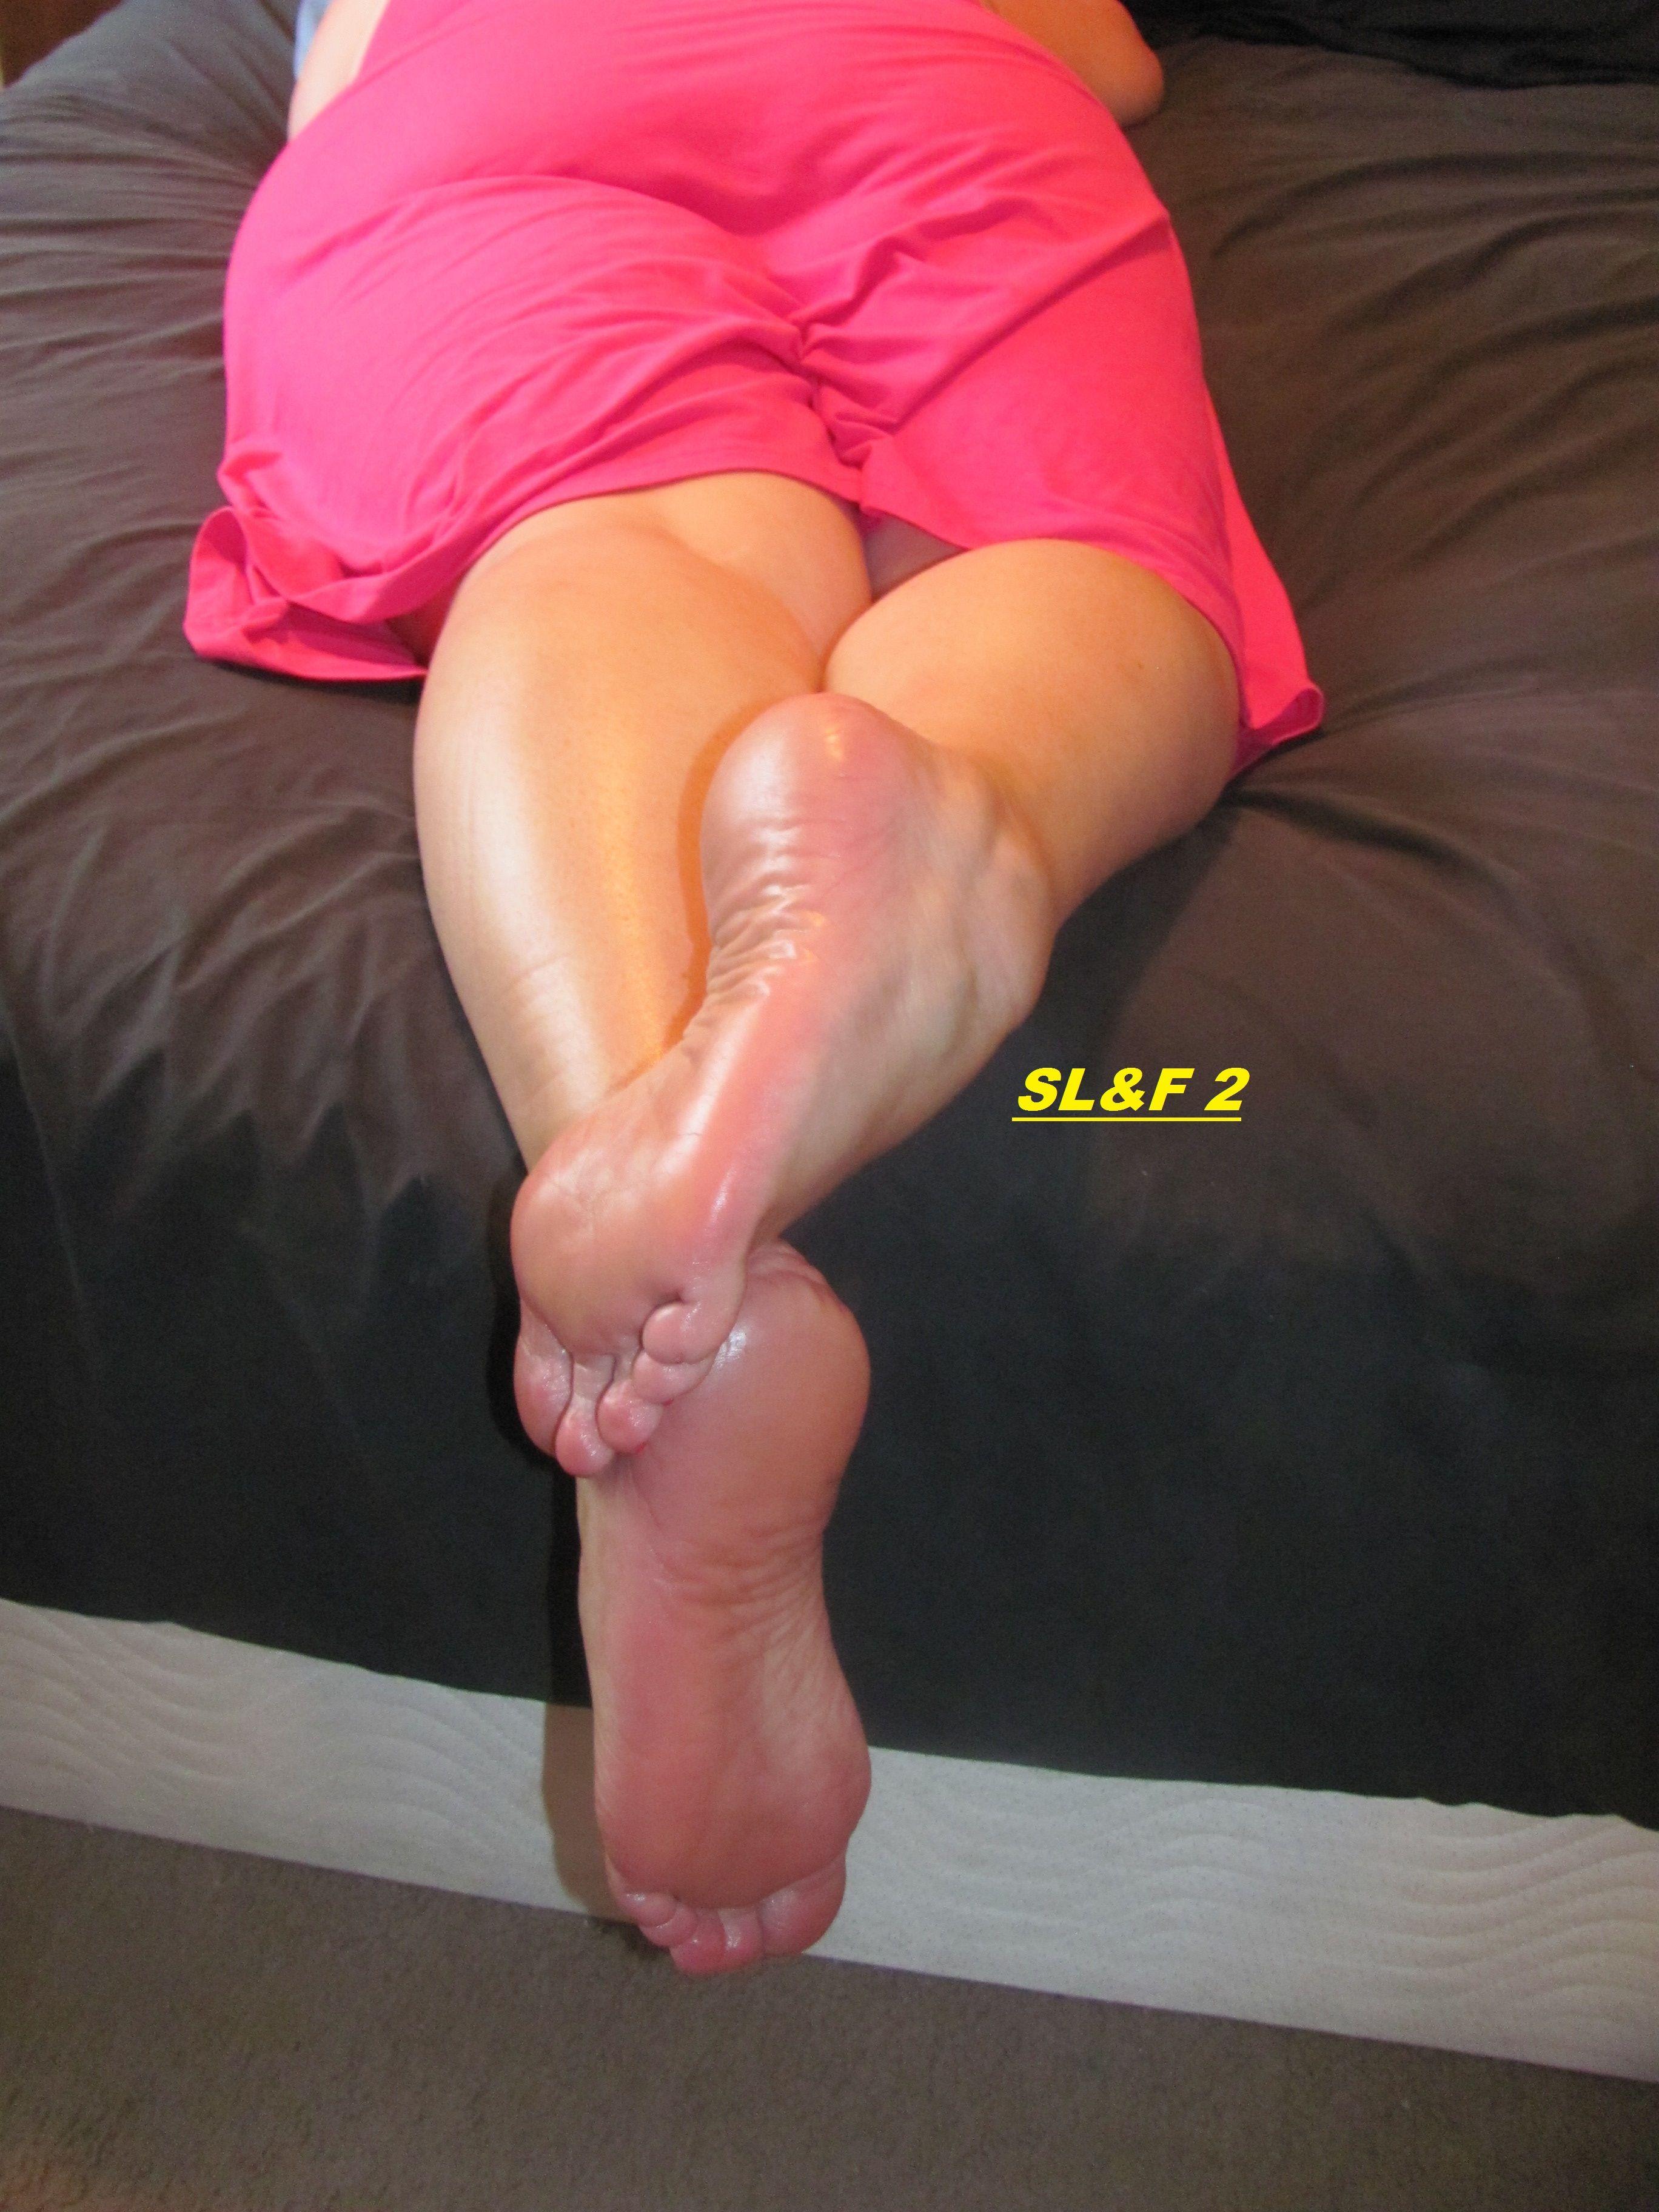 Pin On My Wife S Sexy Legs Feet